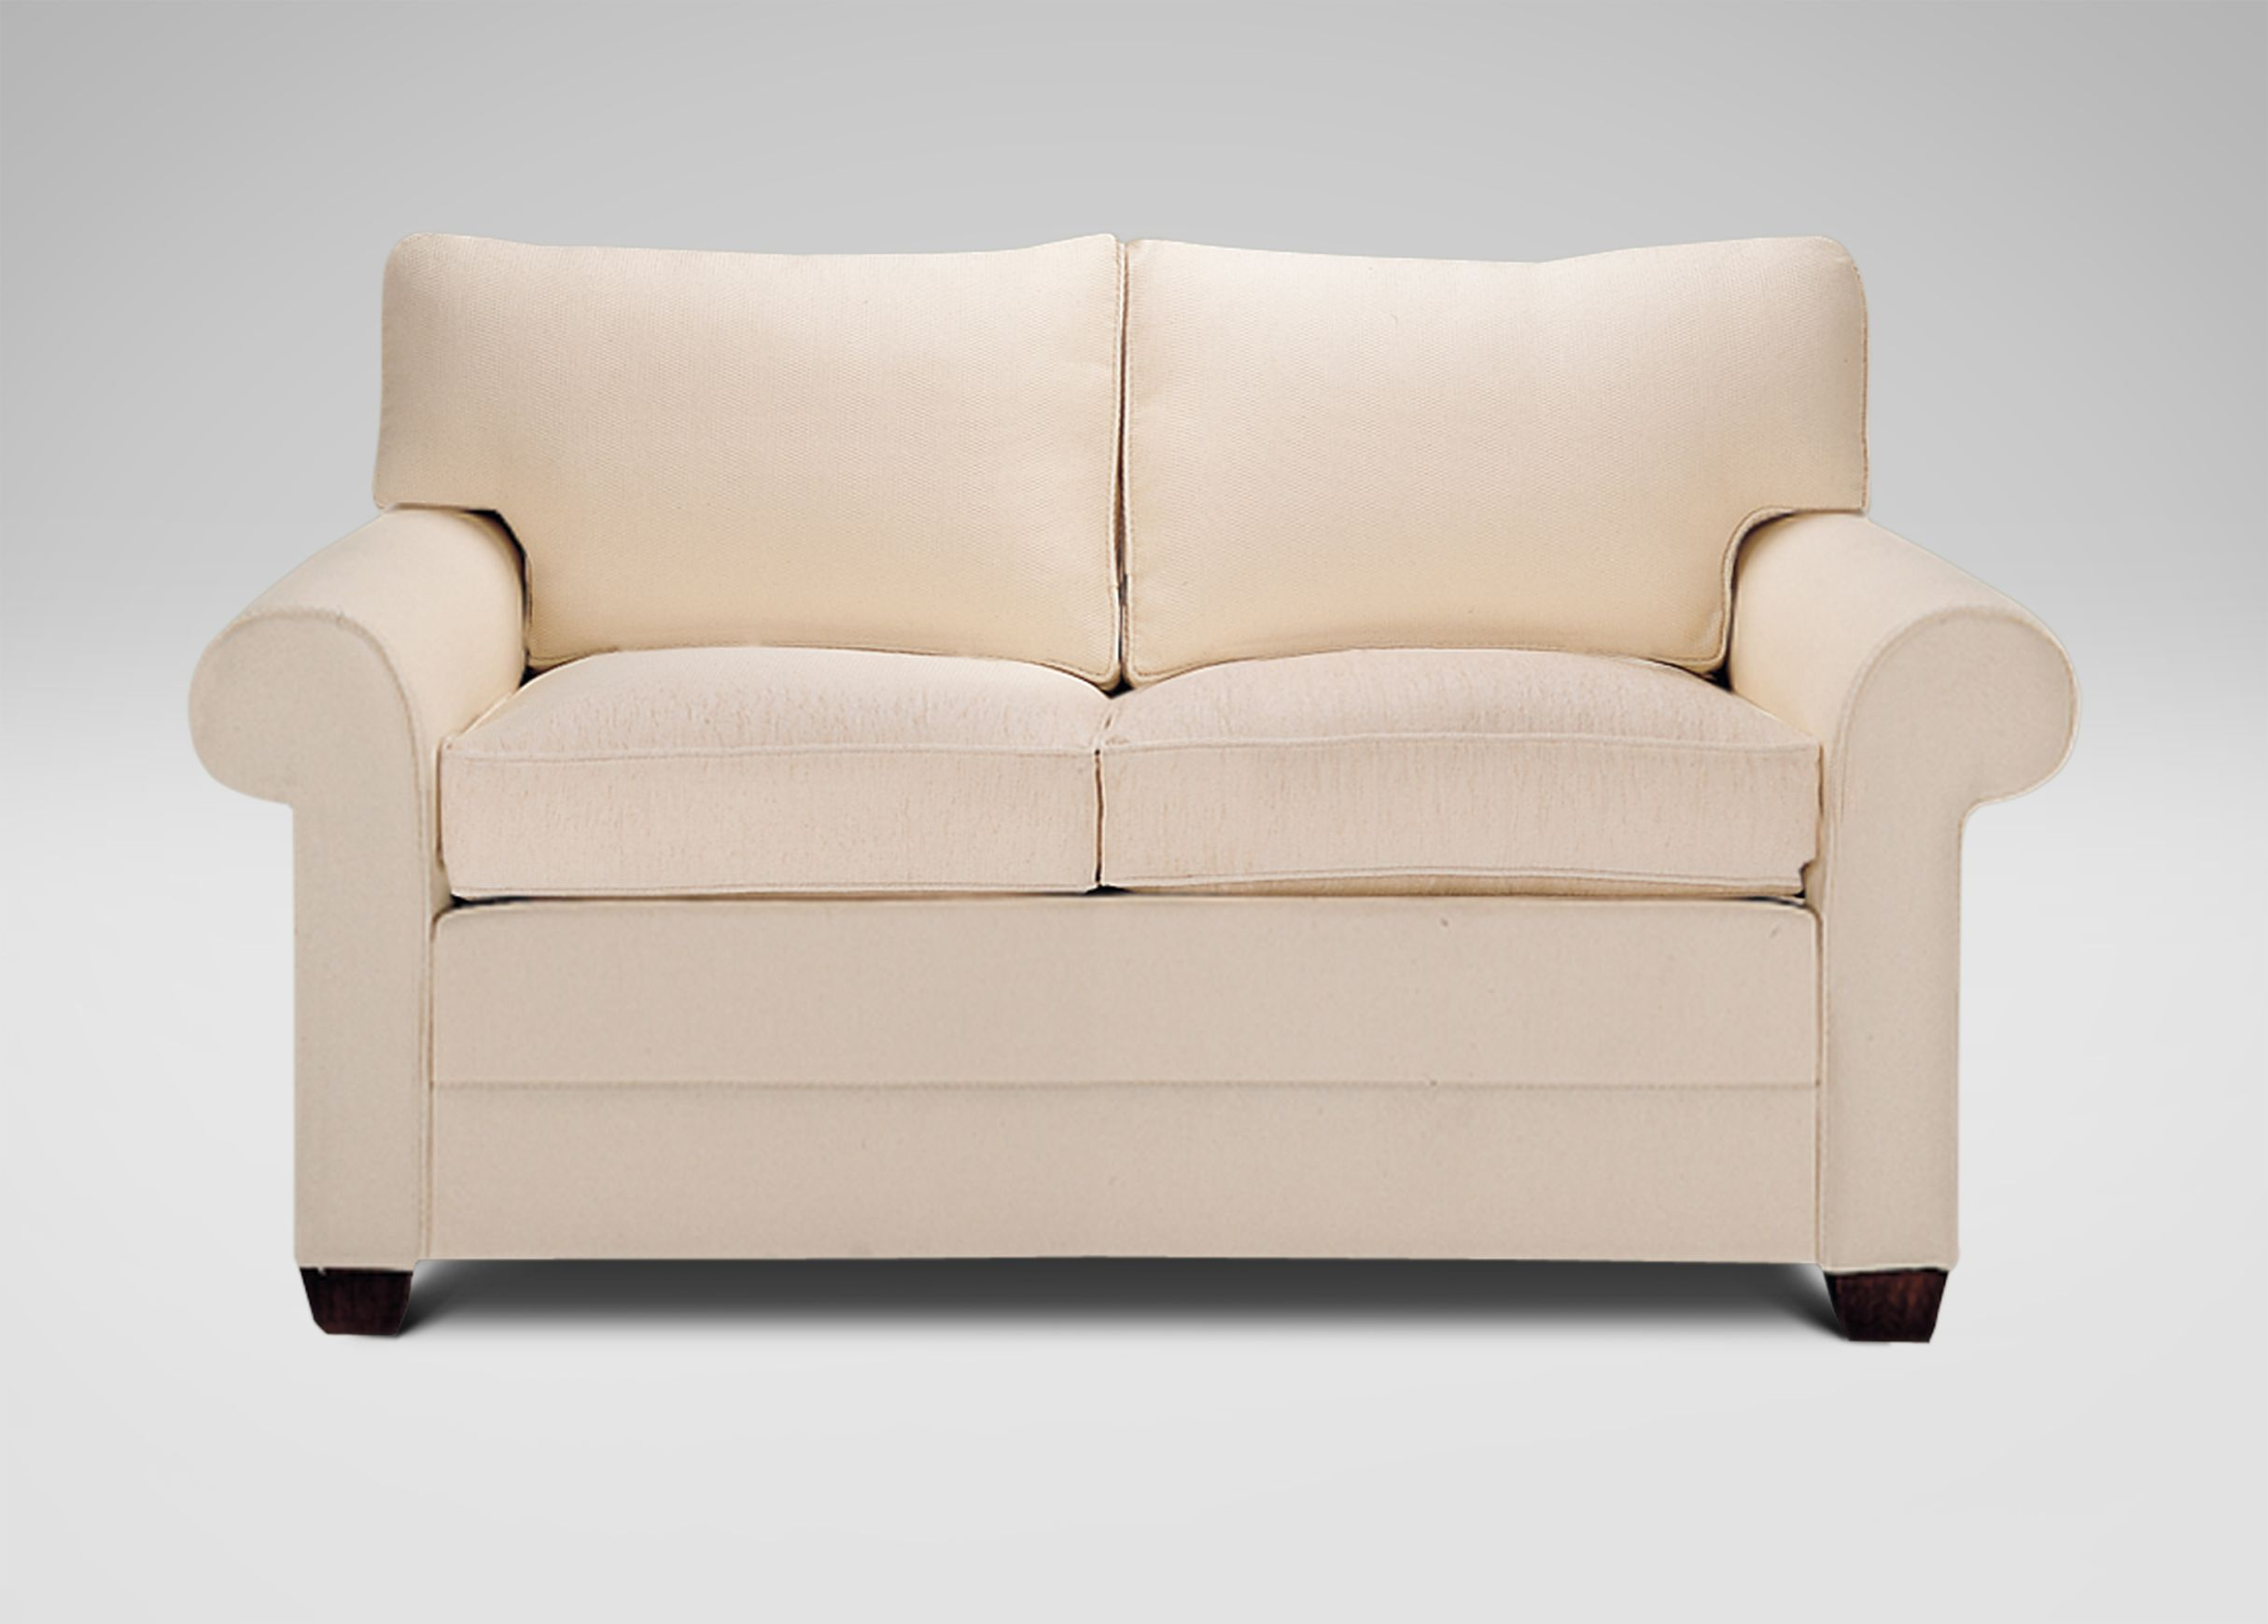 "64"" wide sleeper for kids room or GBR Bennett Roll Arm Sofa"